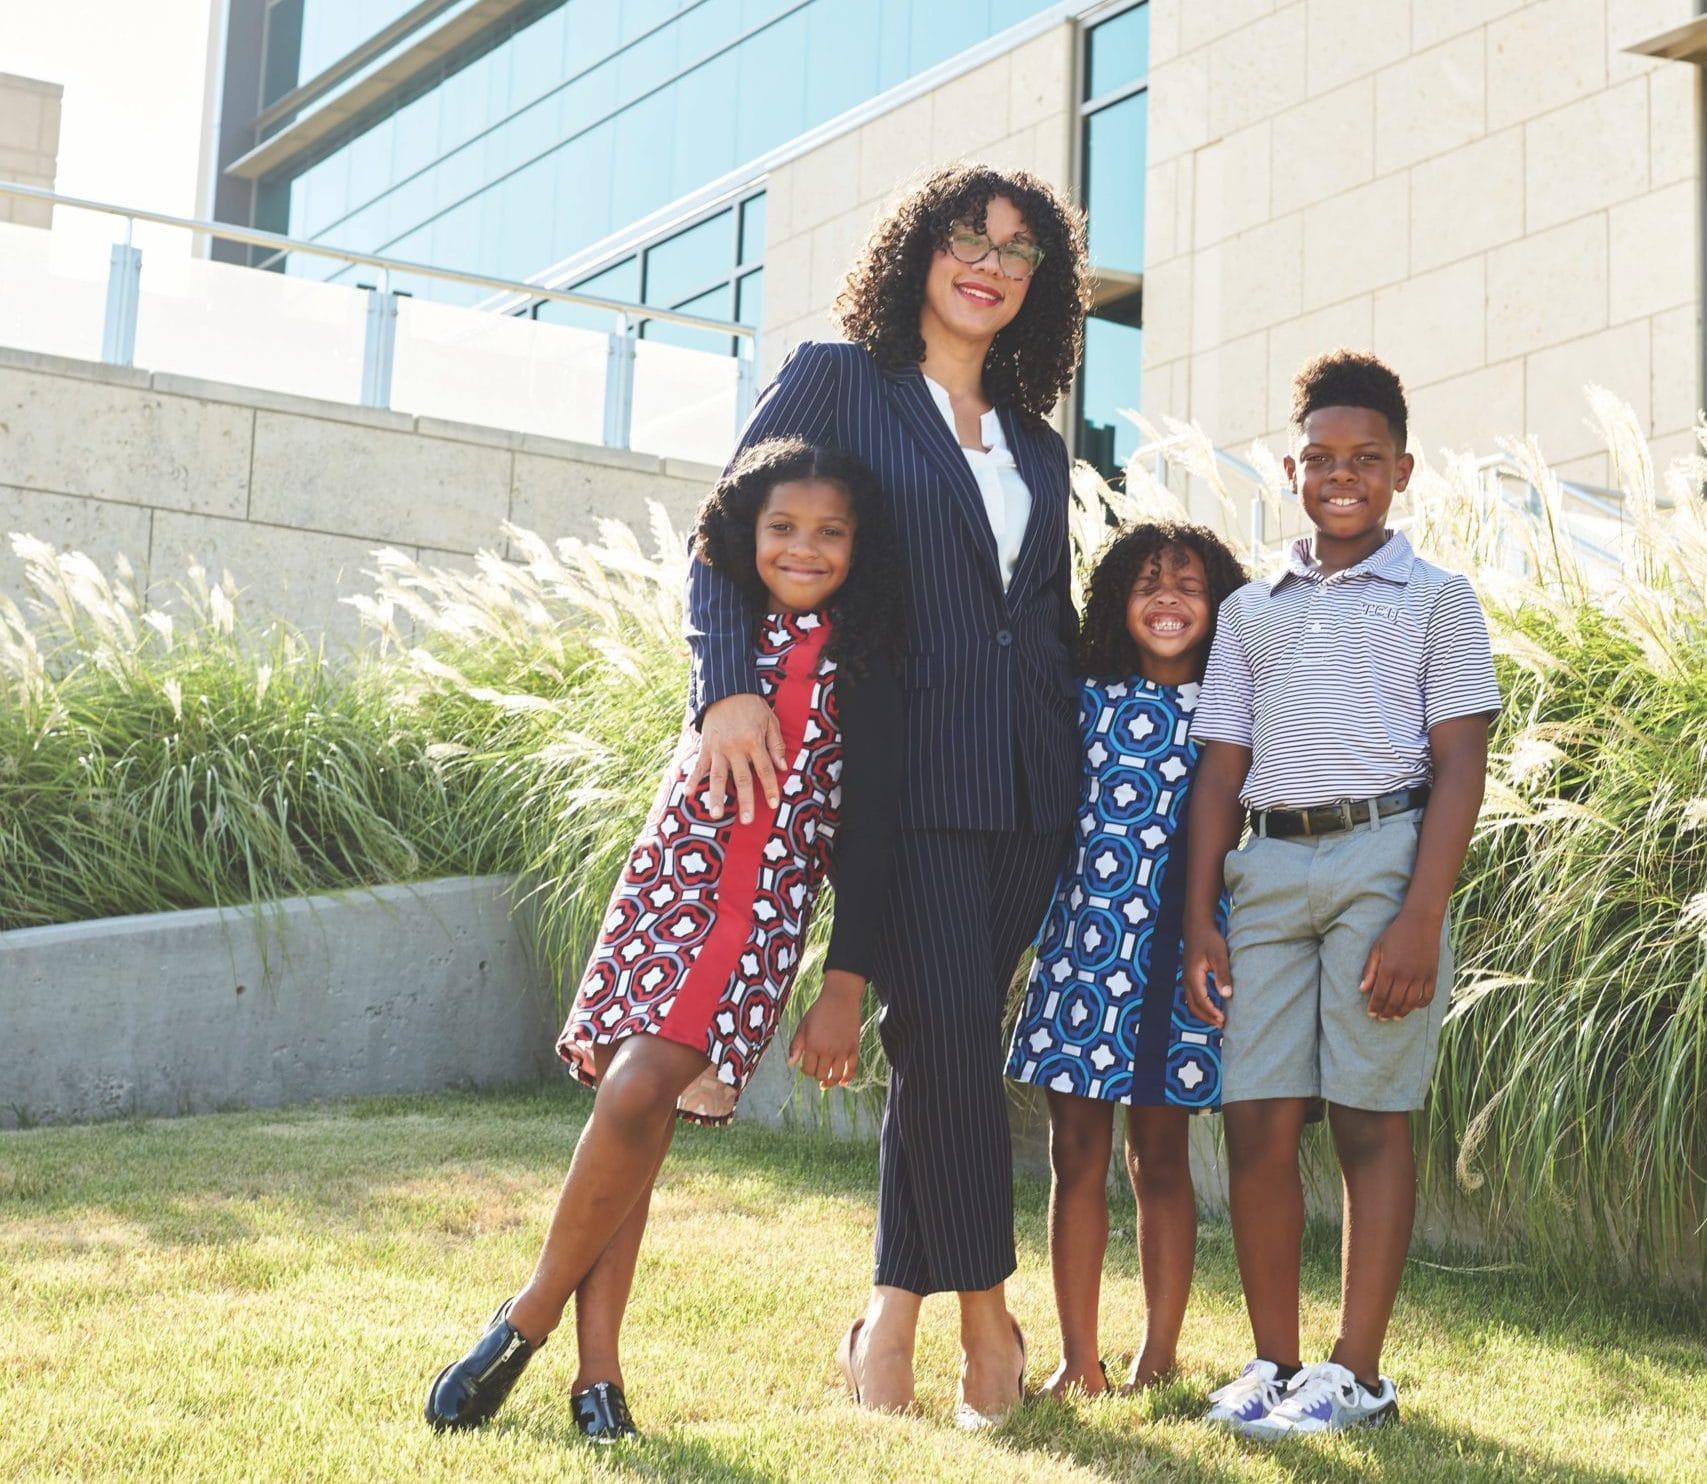 Danika Franks with her three kids